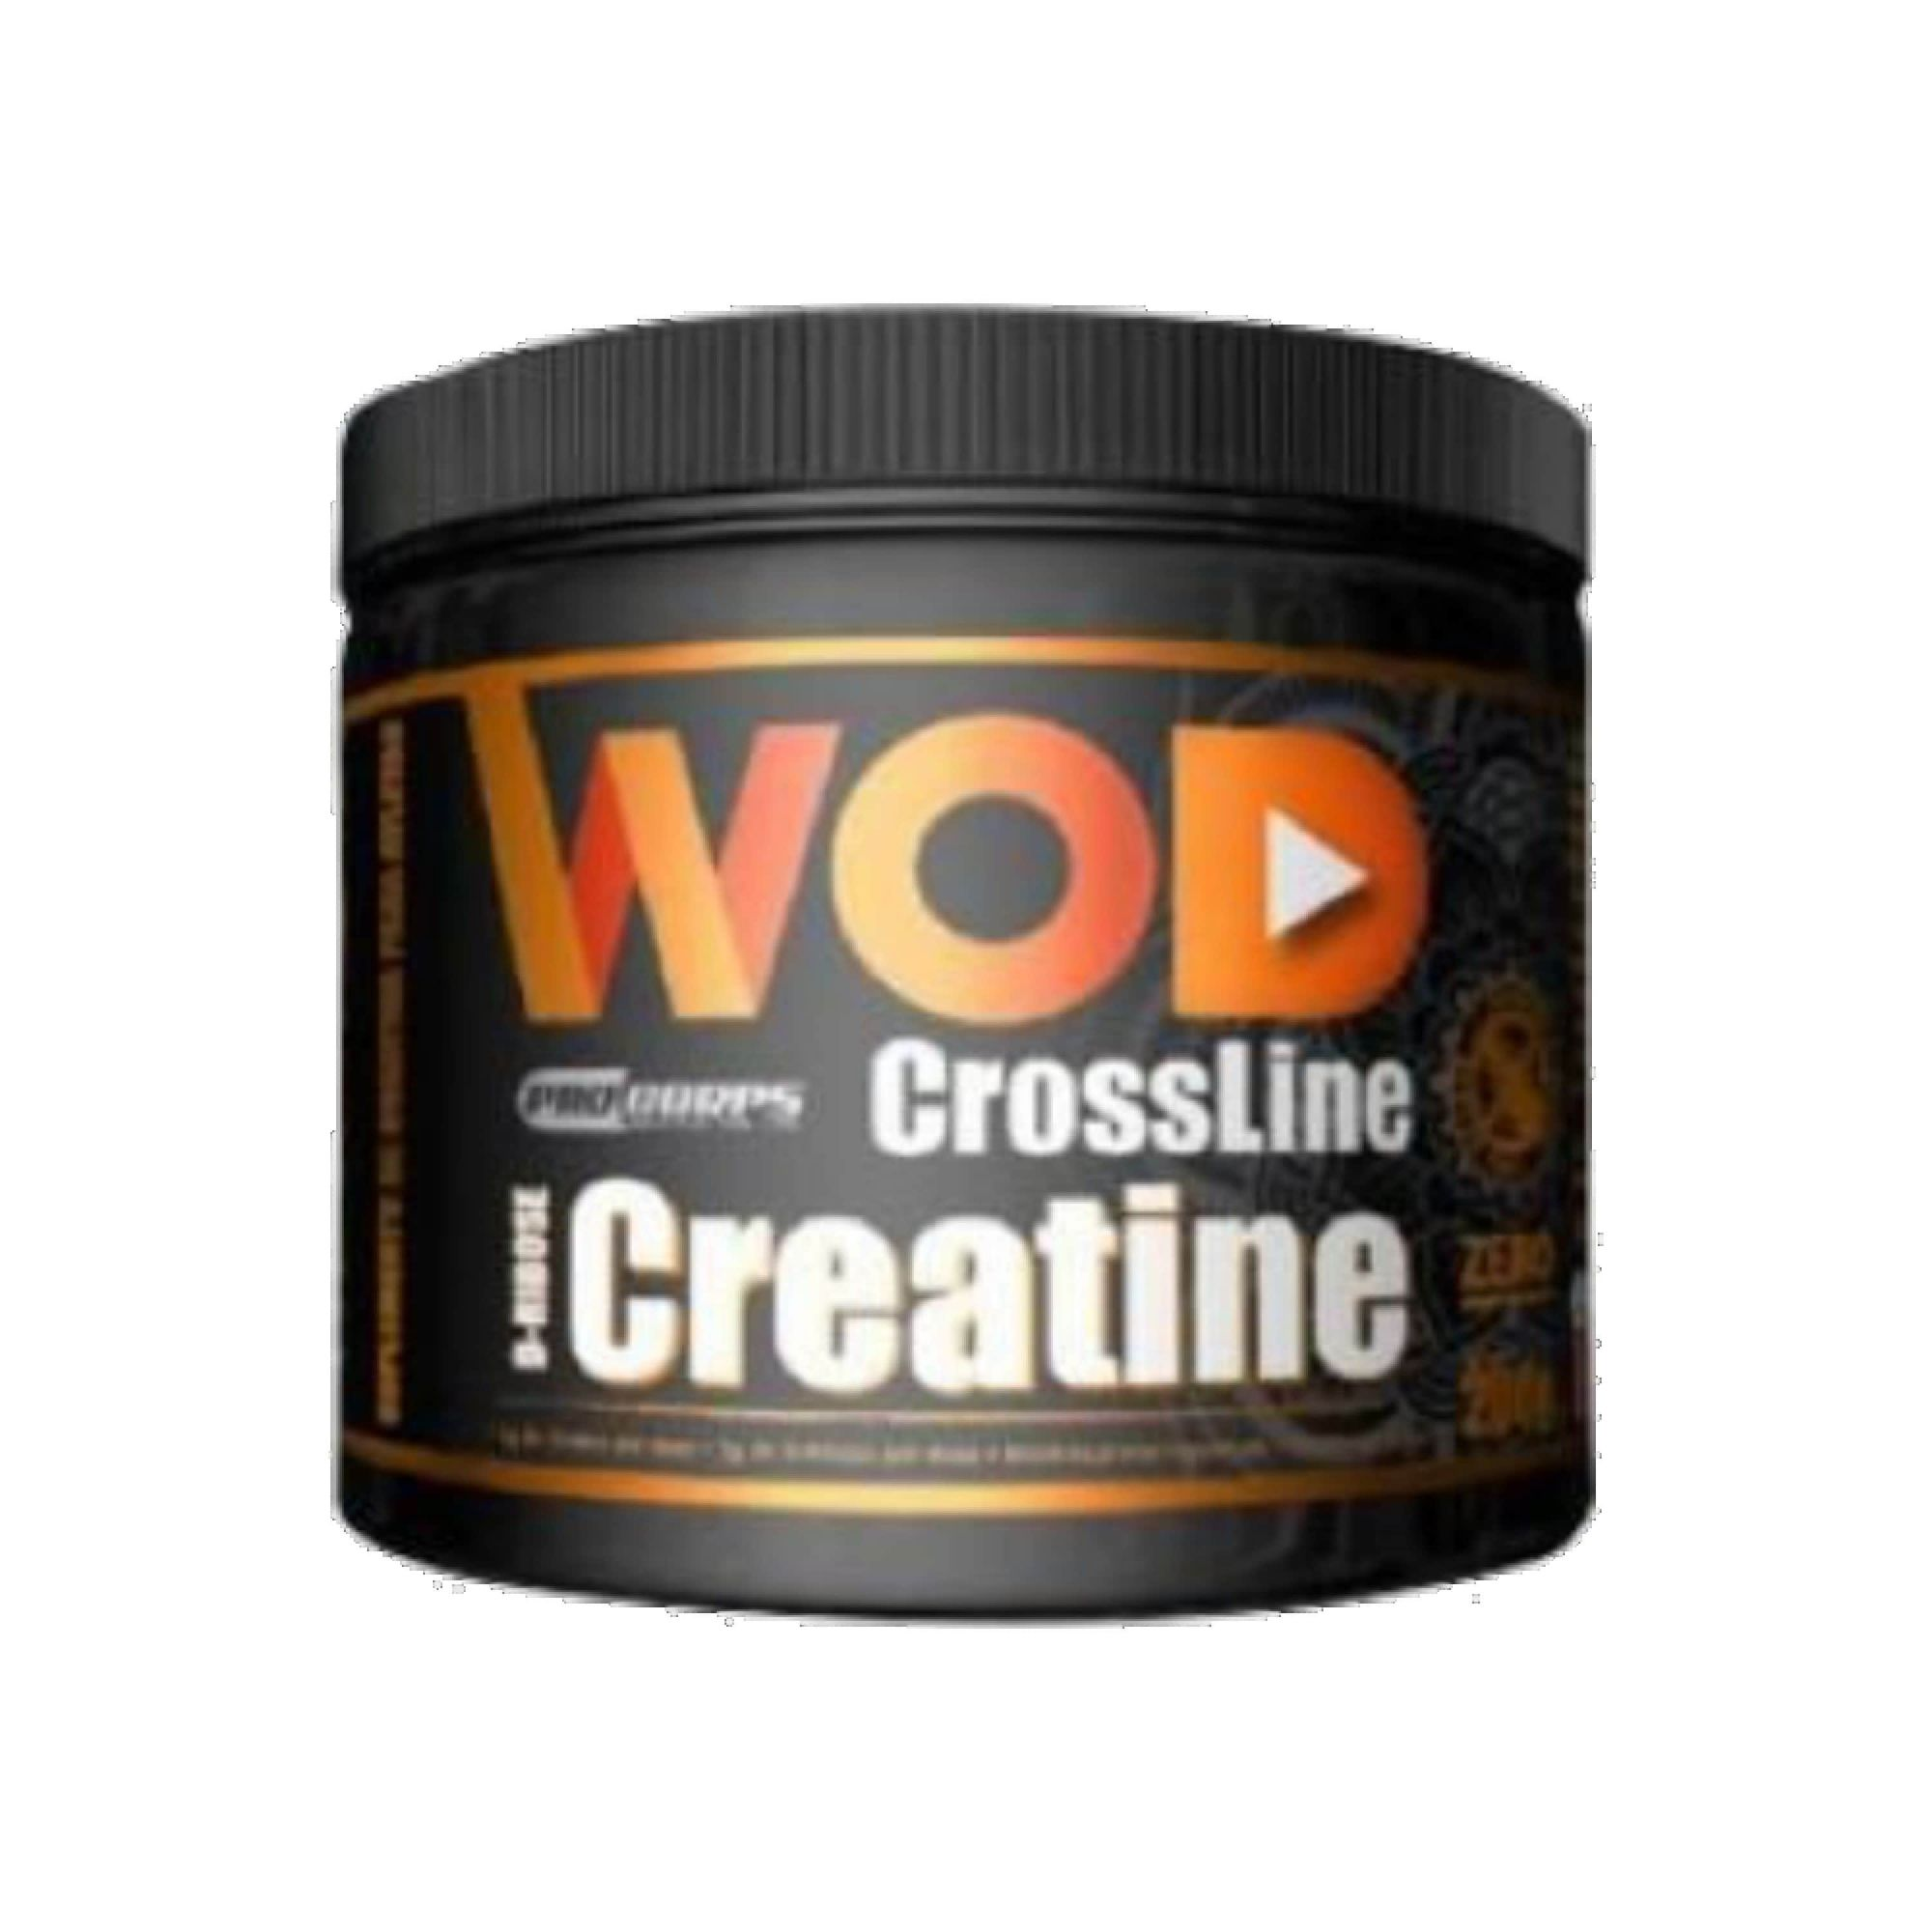 Creatine Crossline | Pro Corps | 200g